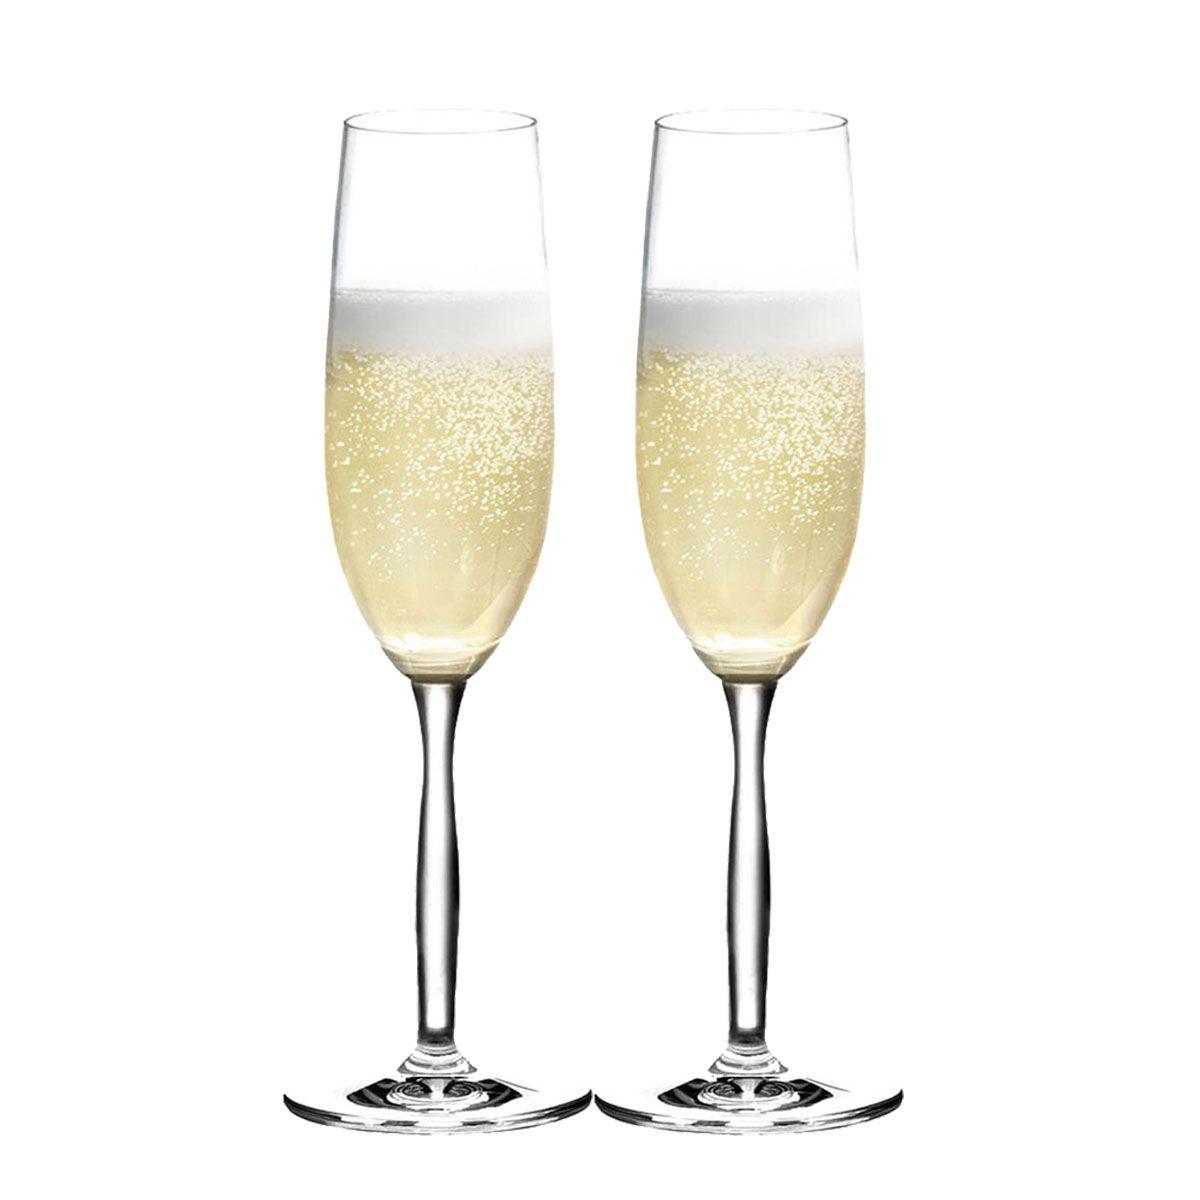 Taça Champagne - Jogo Taça Champanhe Ritz 195ml Kit 2 Pcs